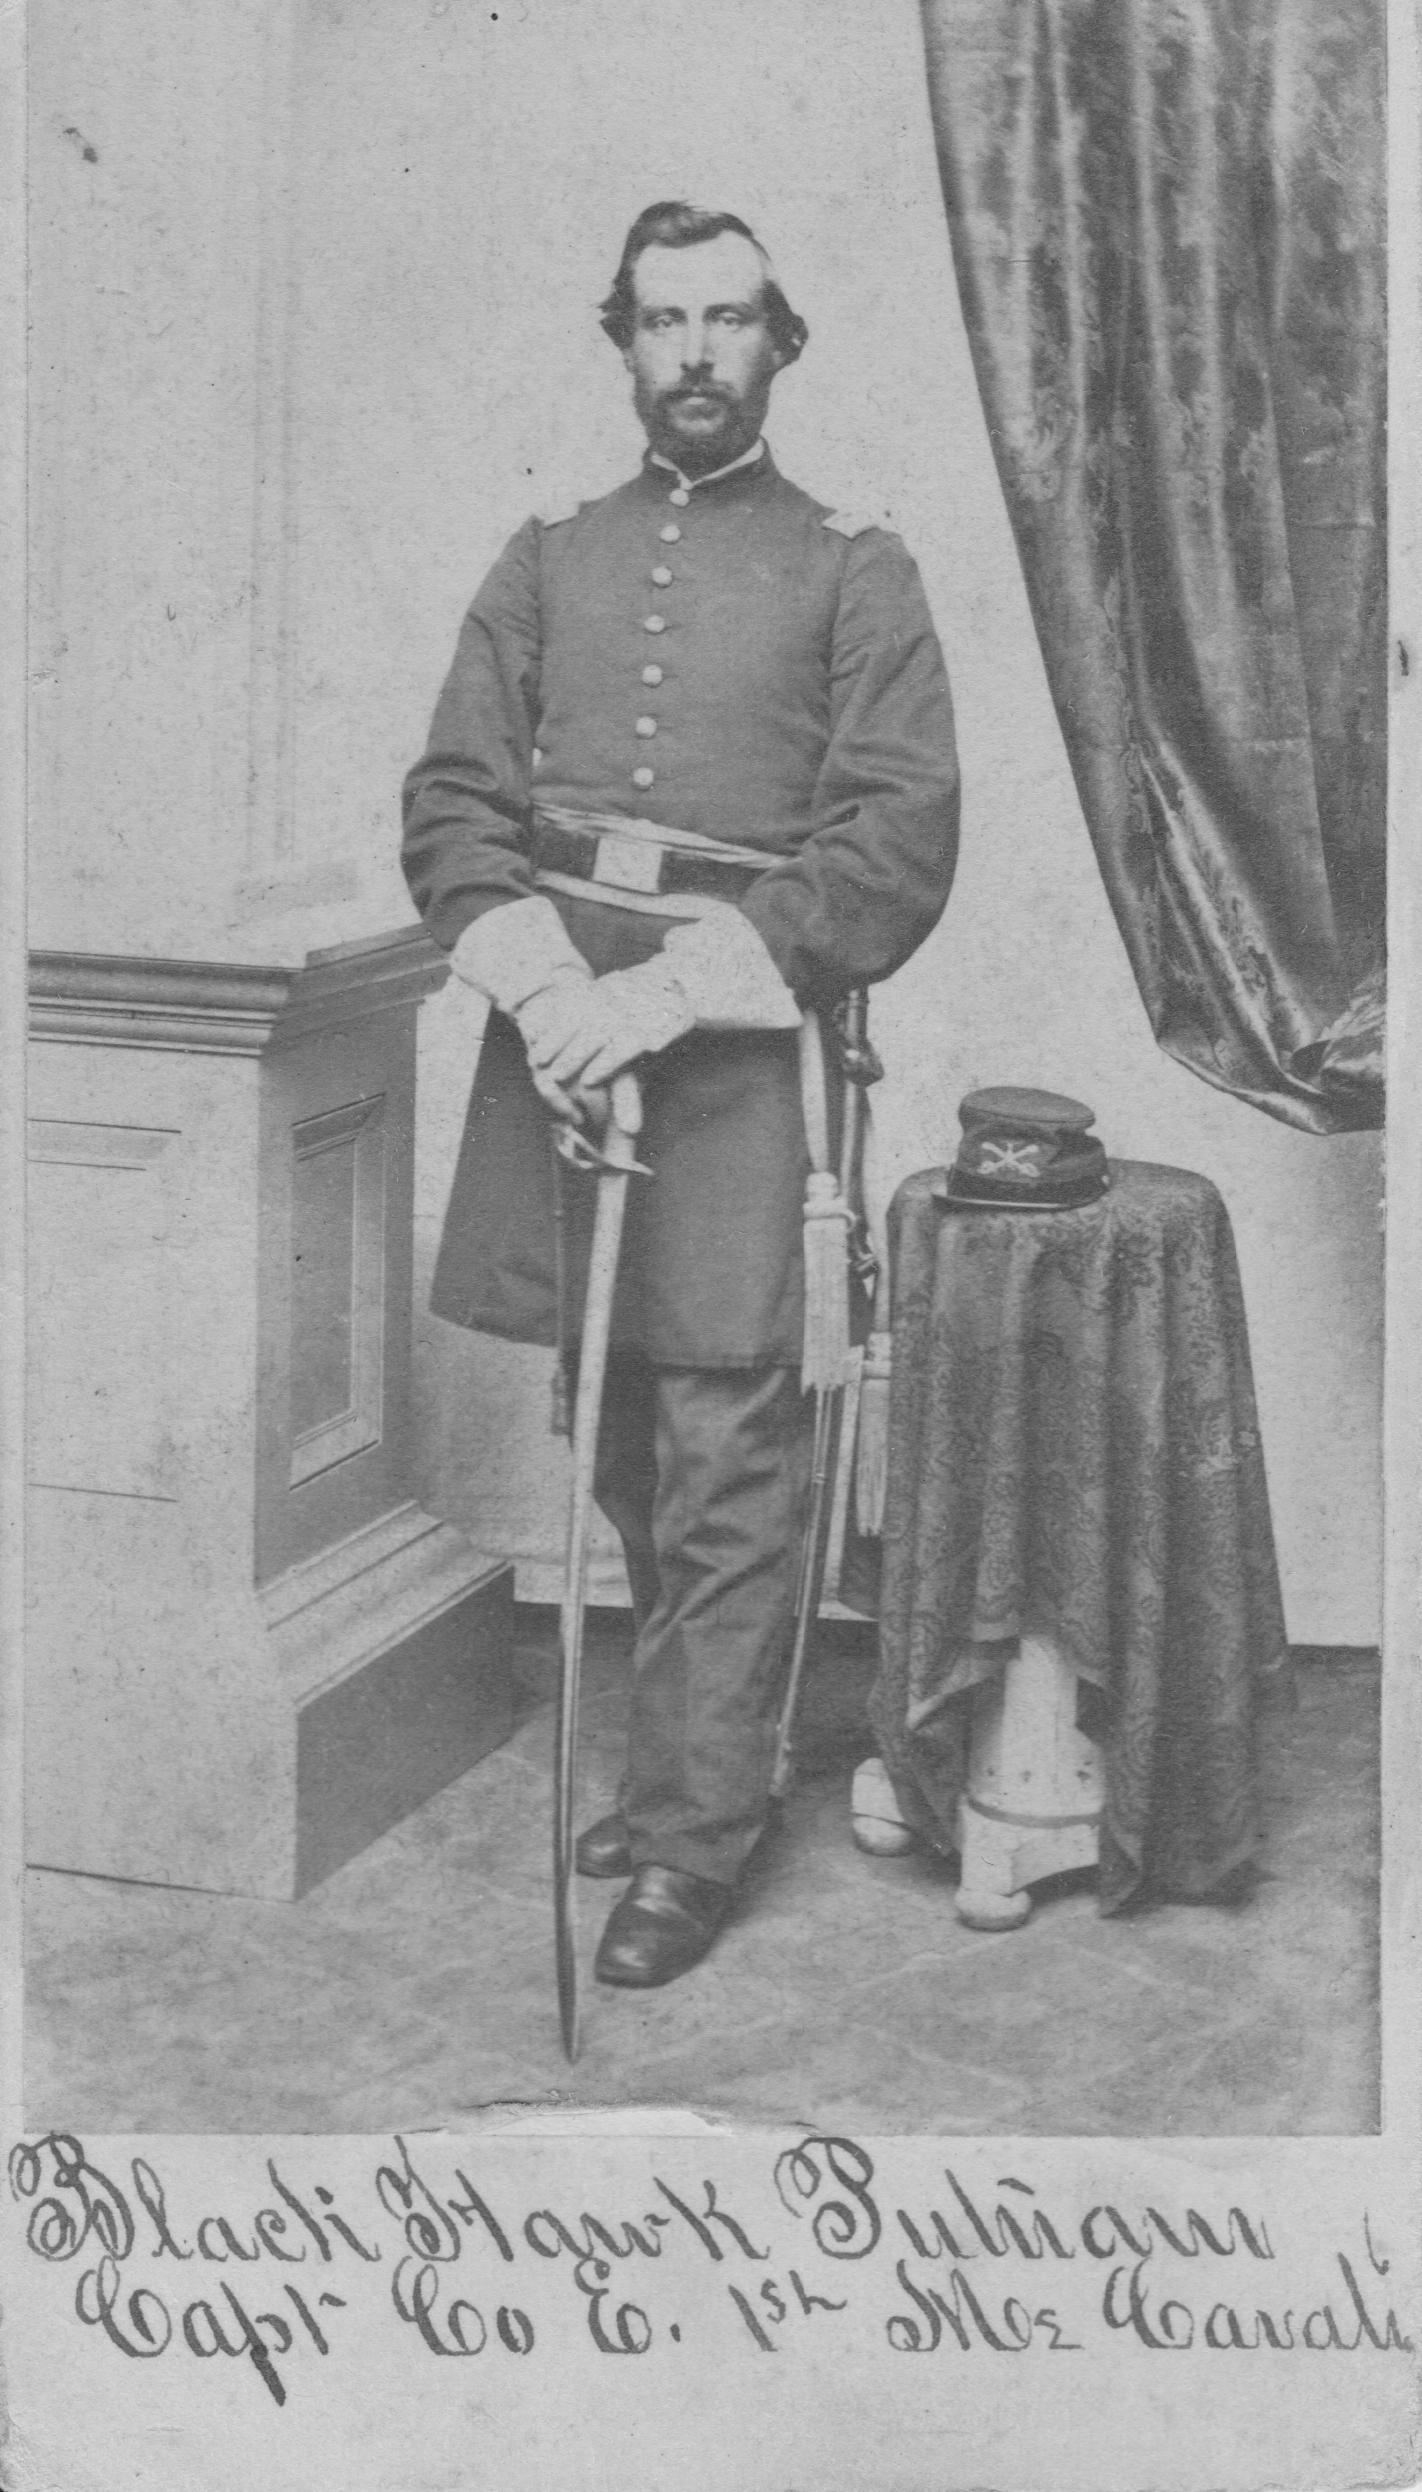 Capt Blackhawk Putnam, Co E 1st Maine Calvary